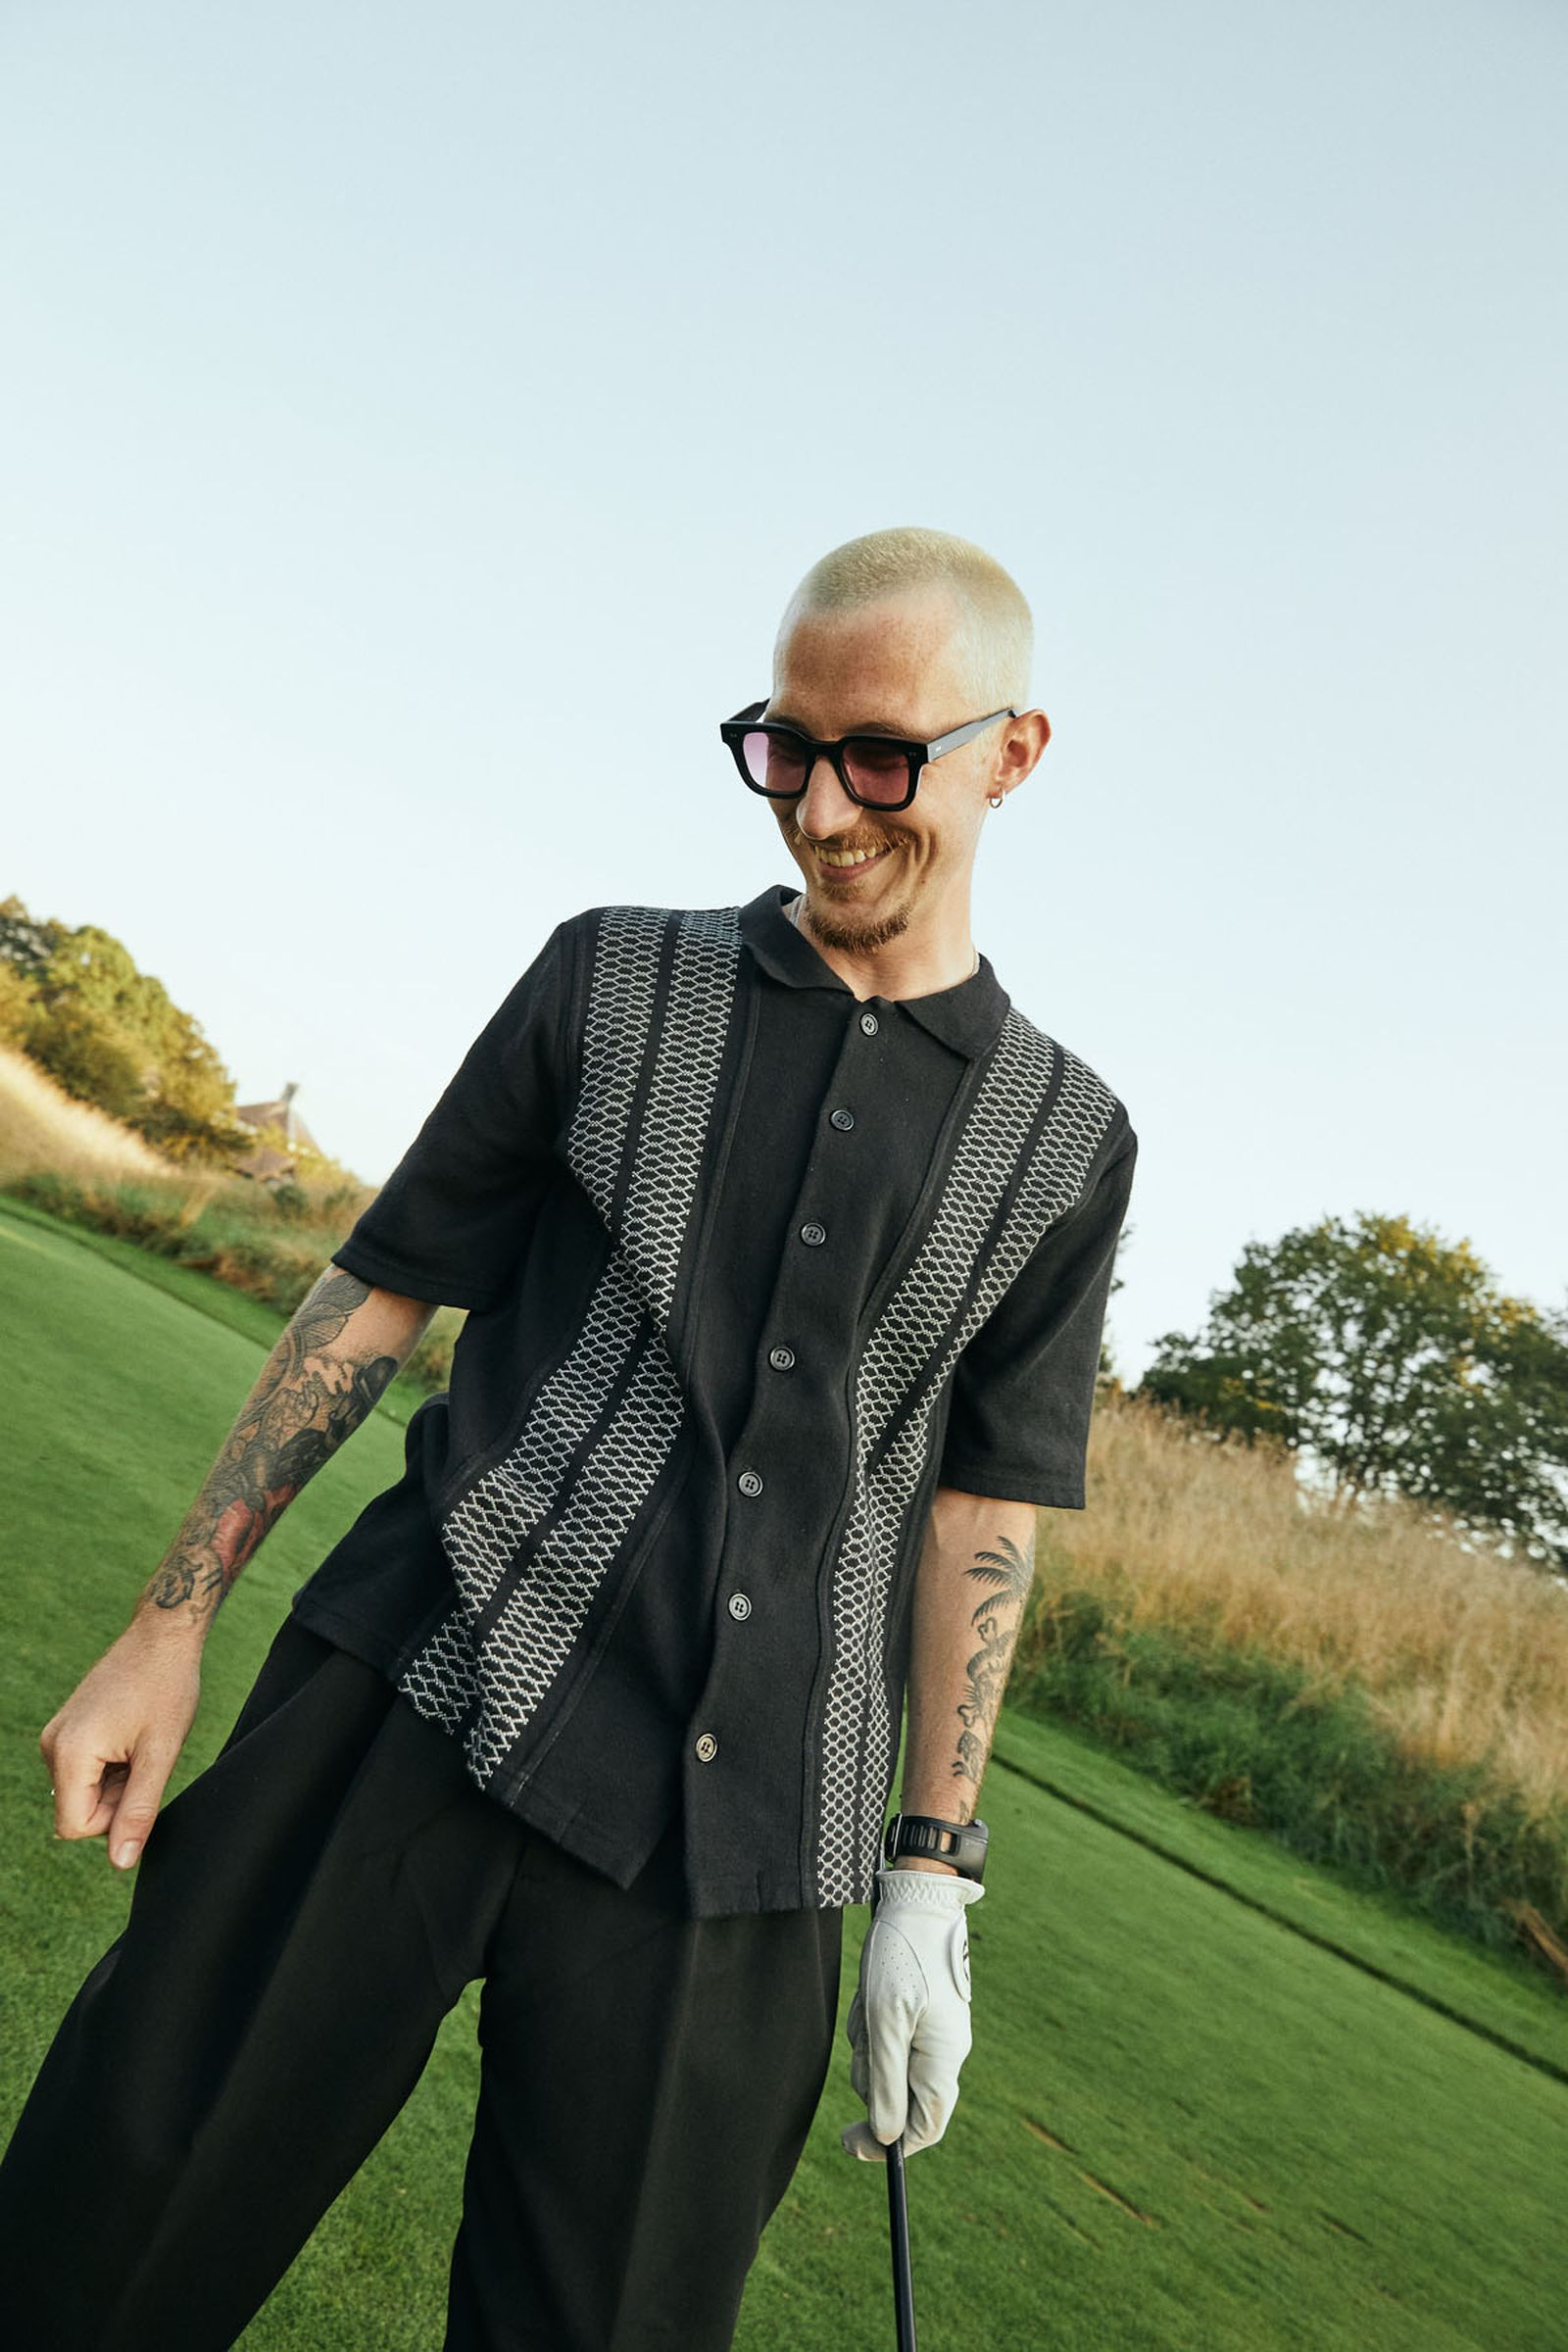 golf-fashion-brands-14